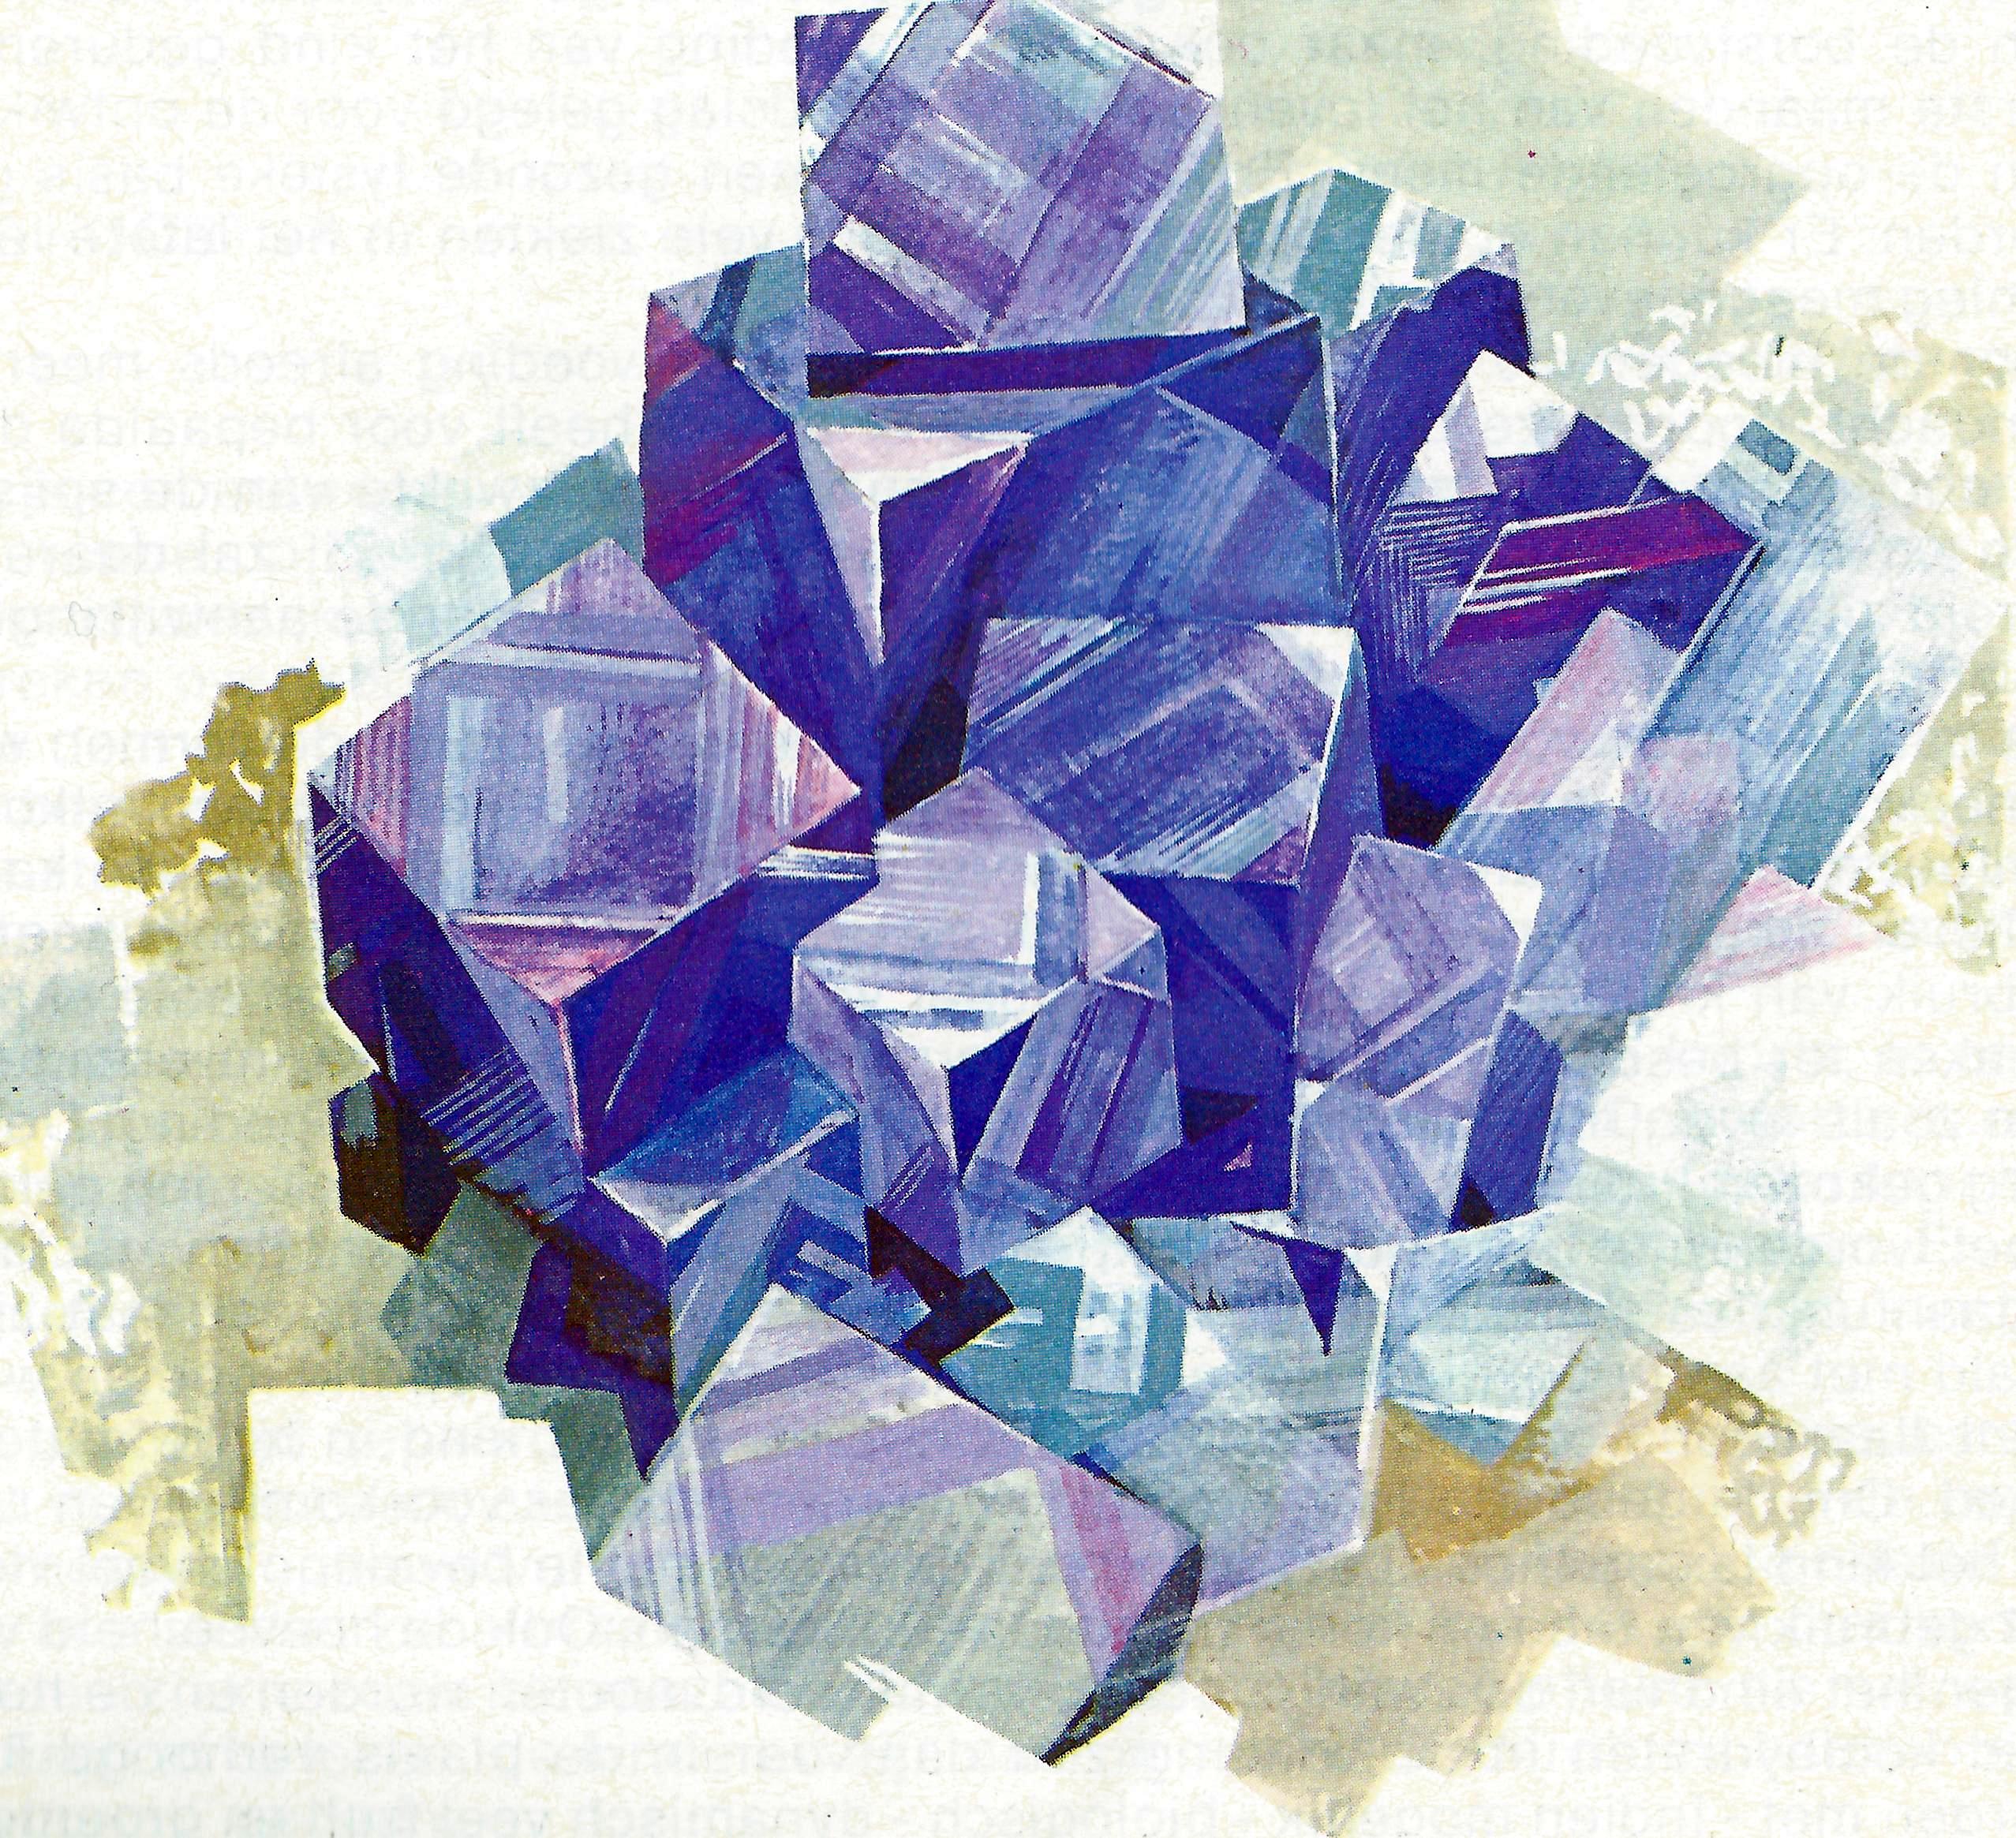 mineralogie vloeispaat